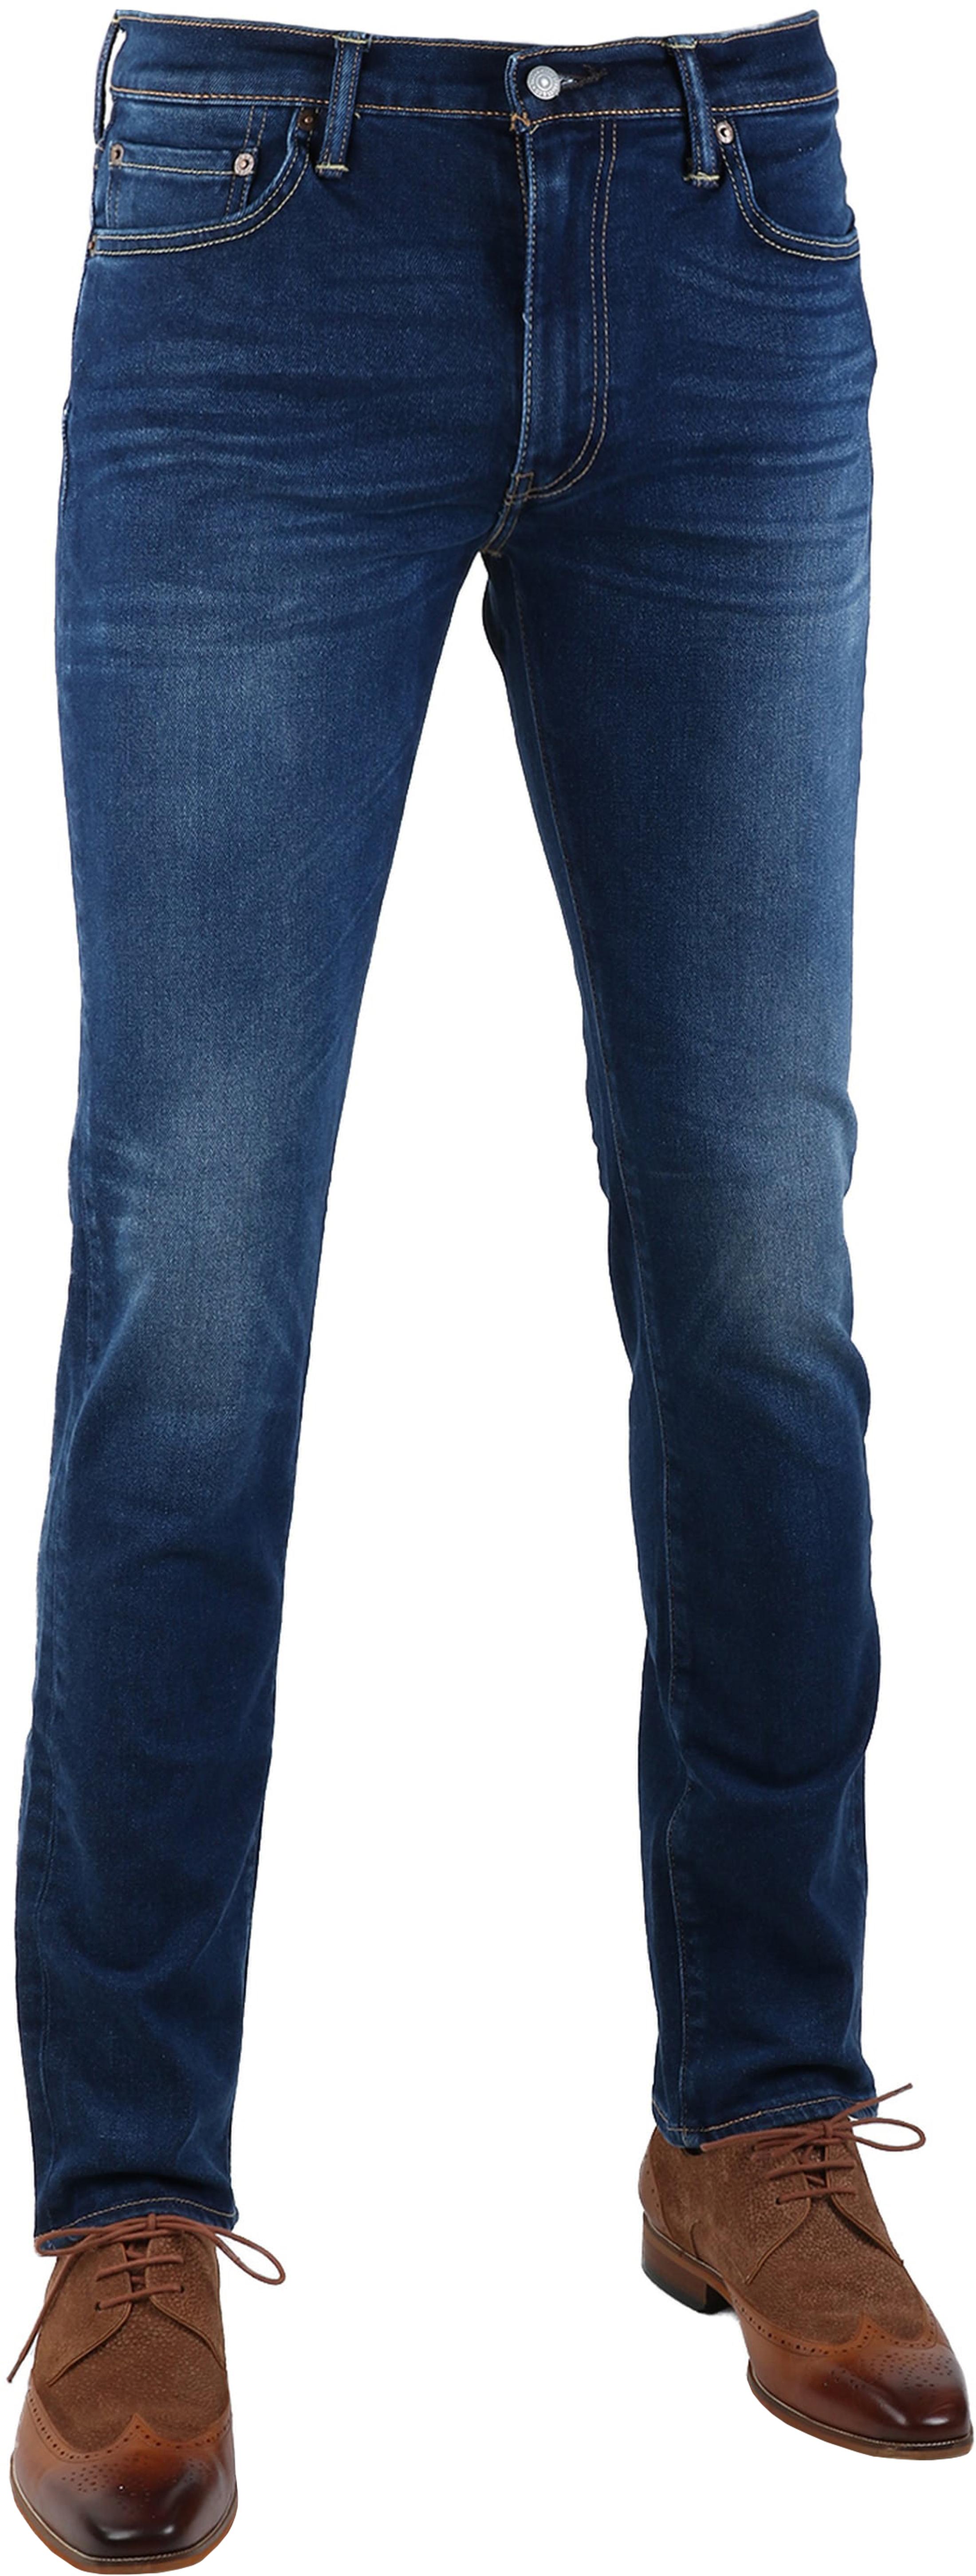 Levi's 511 Jeans Slim Fit Midblue 2006 foto 0